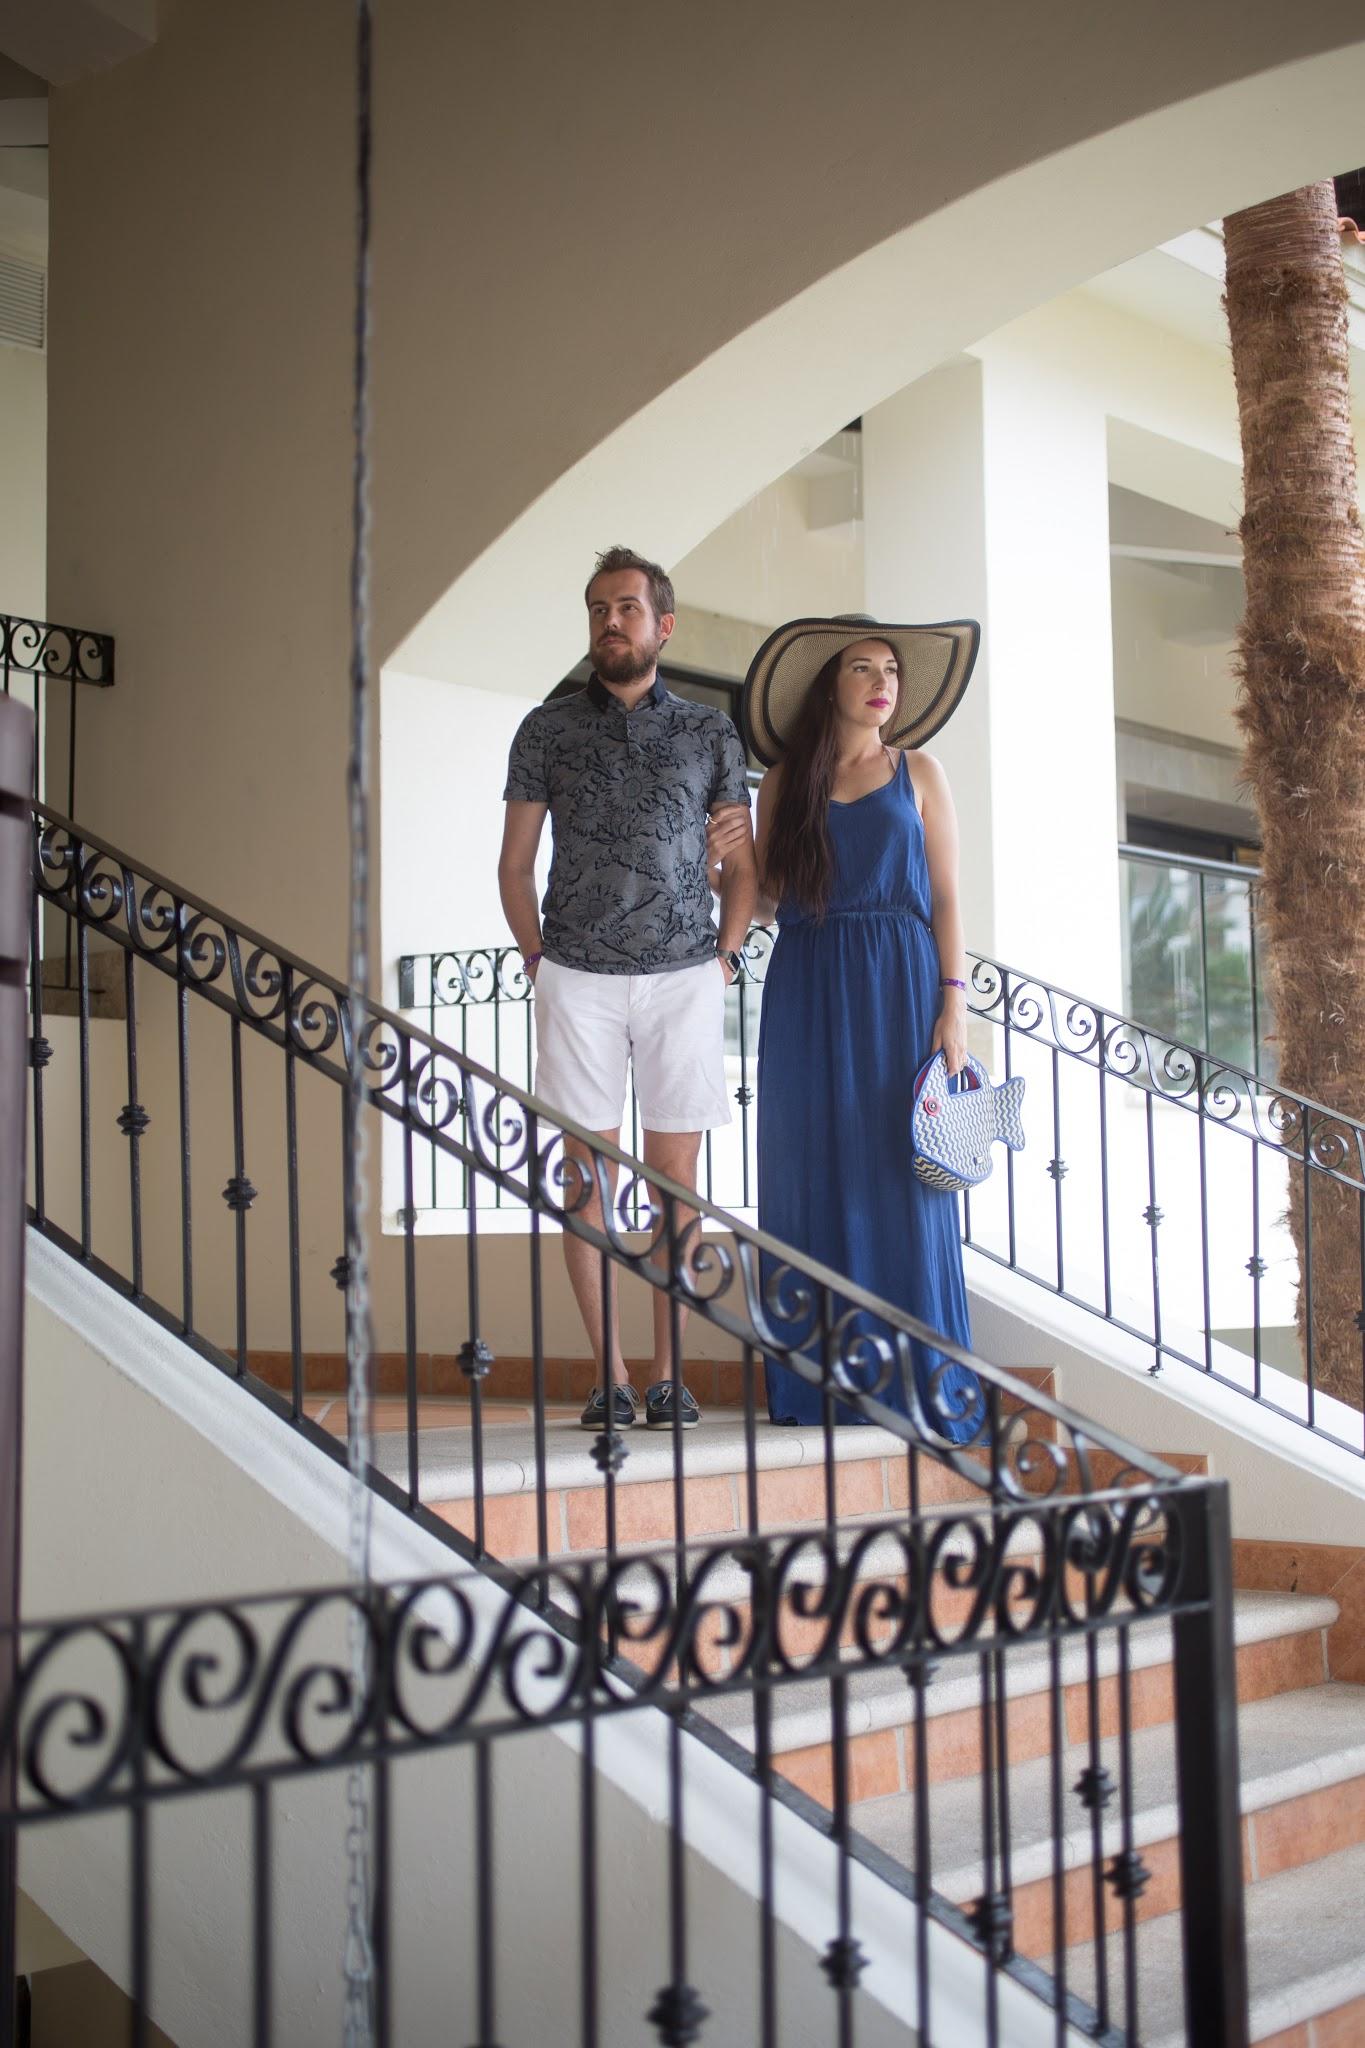 Couples Resort Beach Wear Style